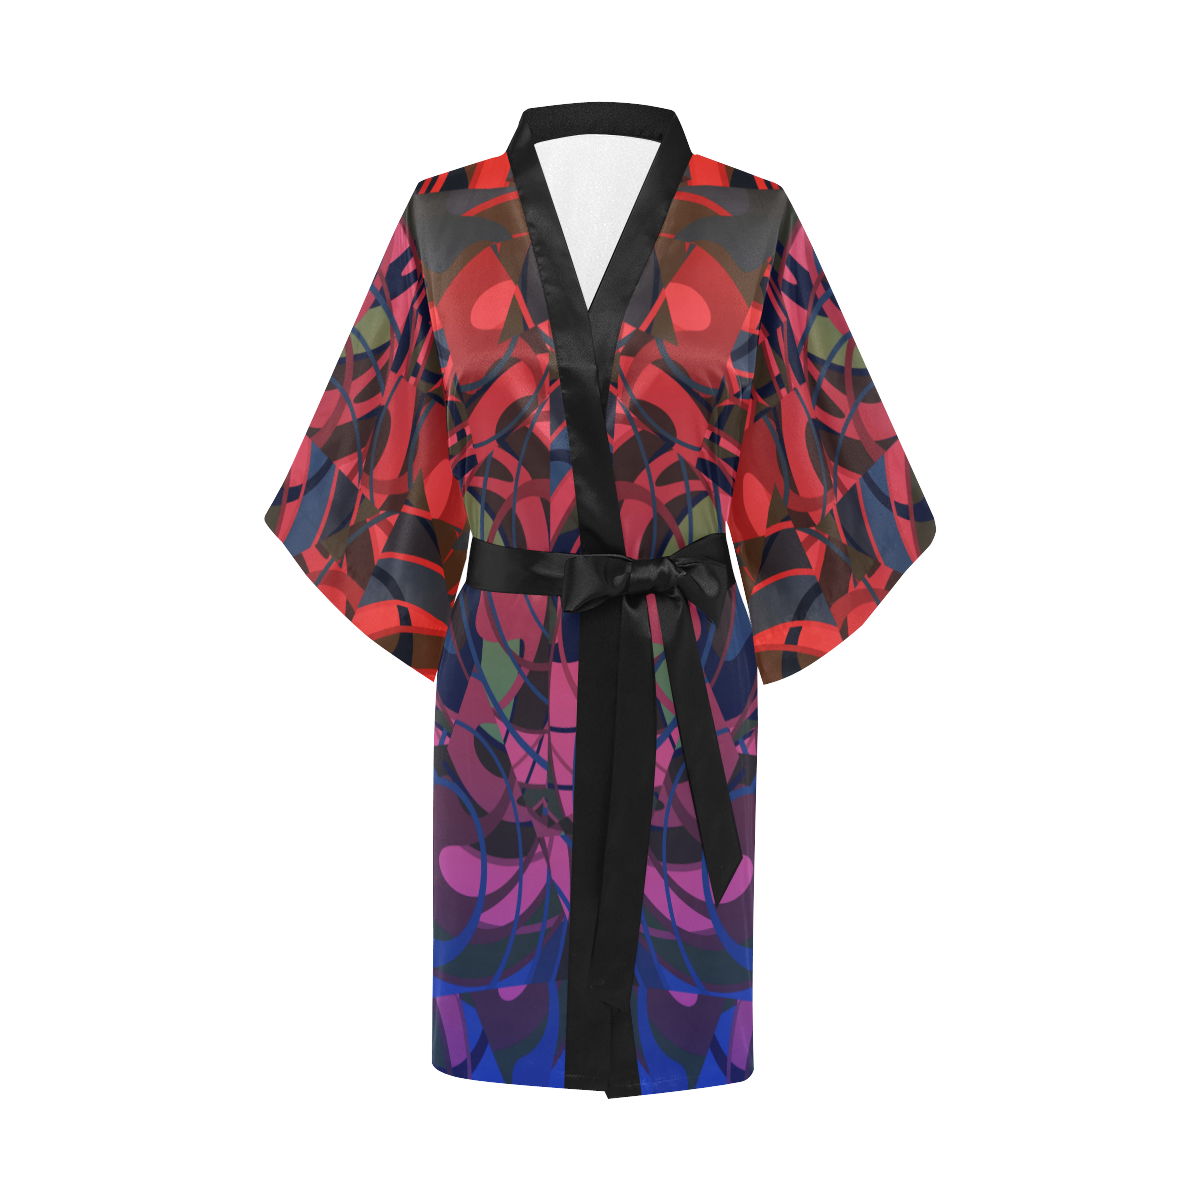 Hot Summer Nights Blue and Red Kimono Robe